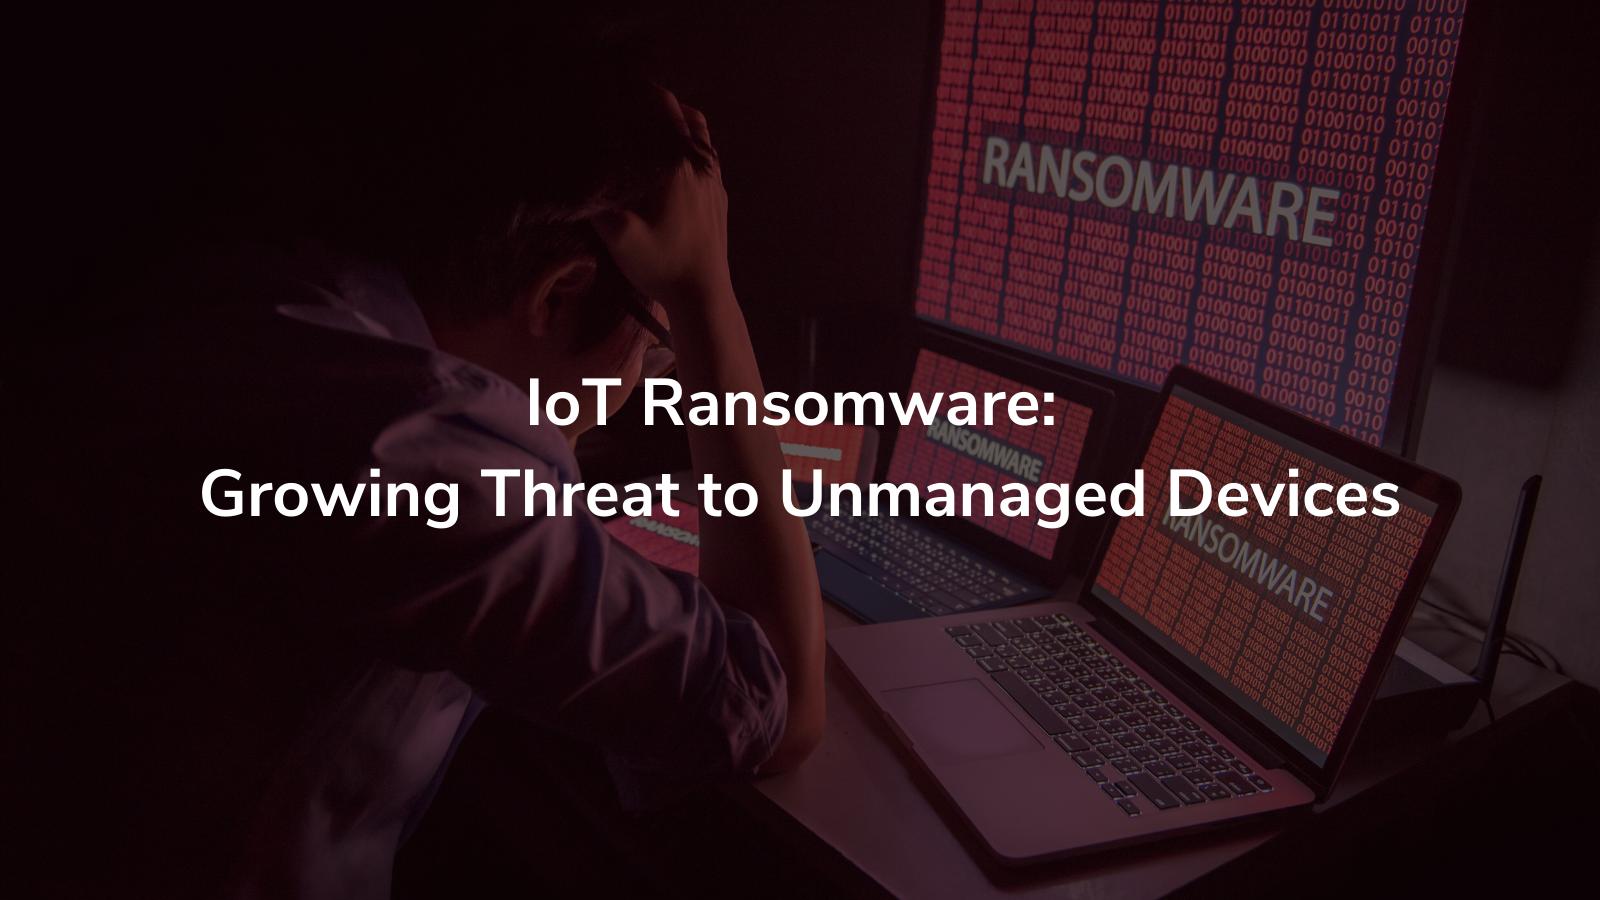 IoT Ransomware